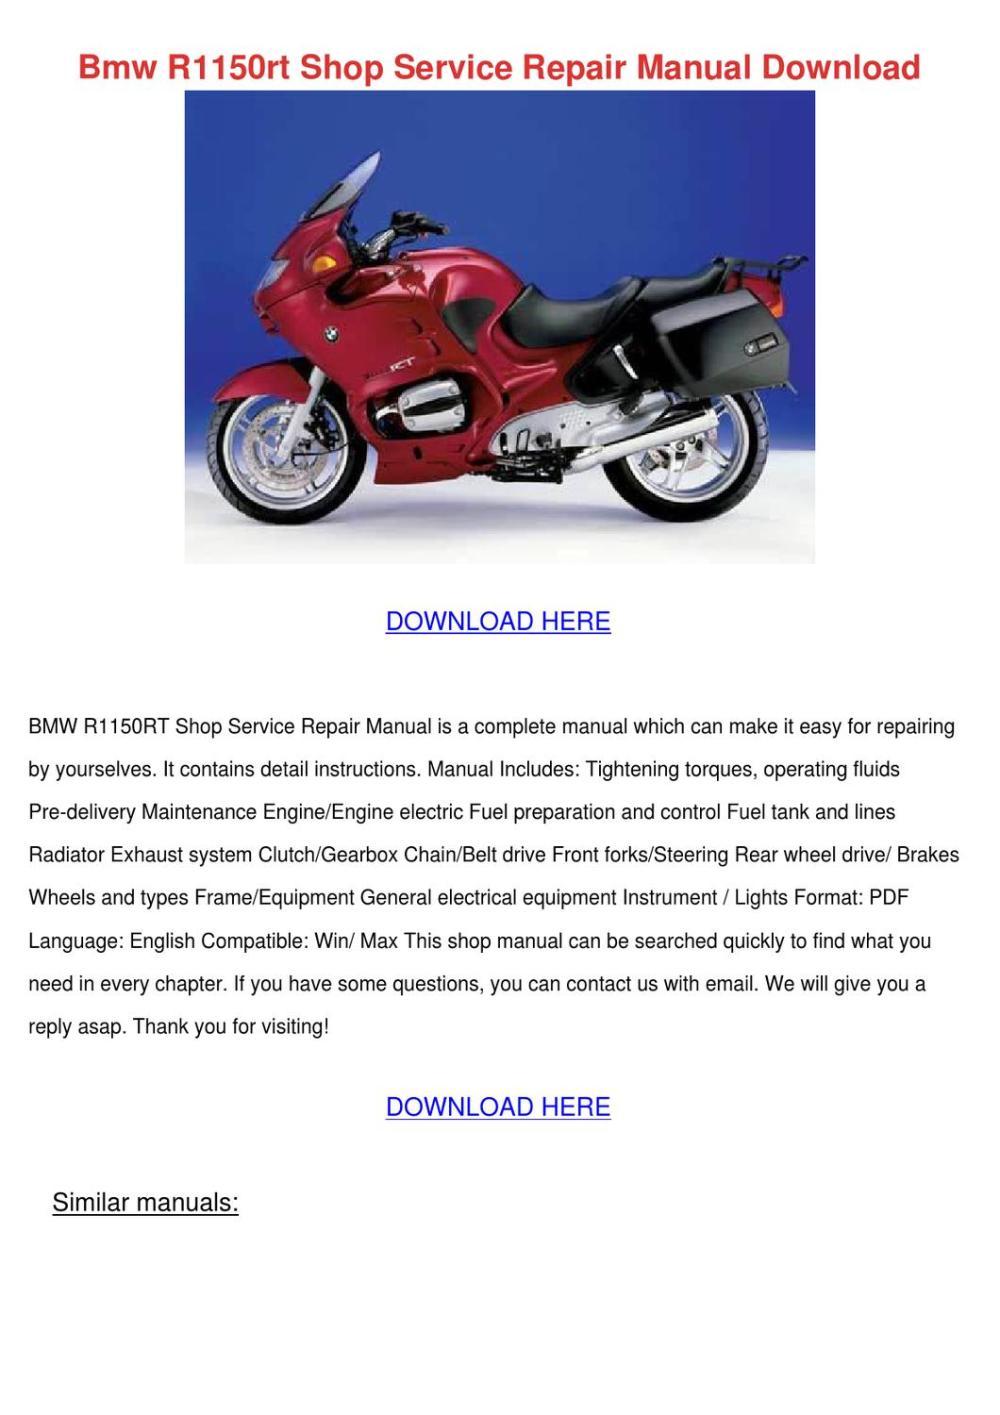 medium resolution of bmw r1150rt shop service repair manual downlo